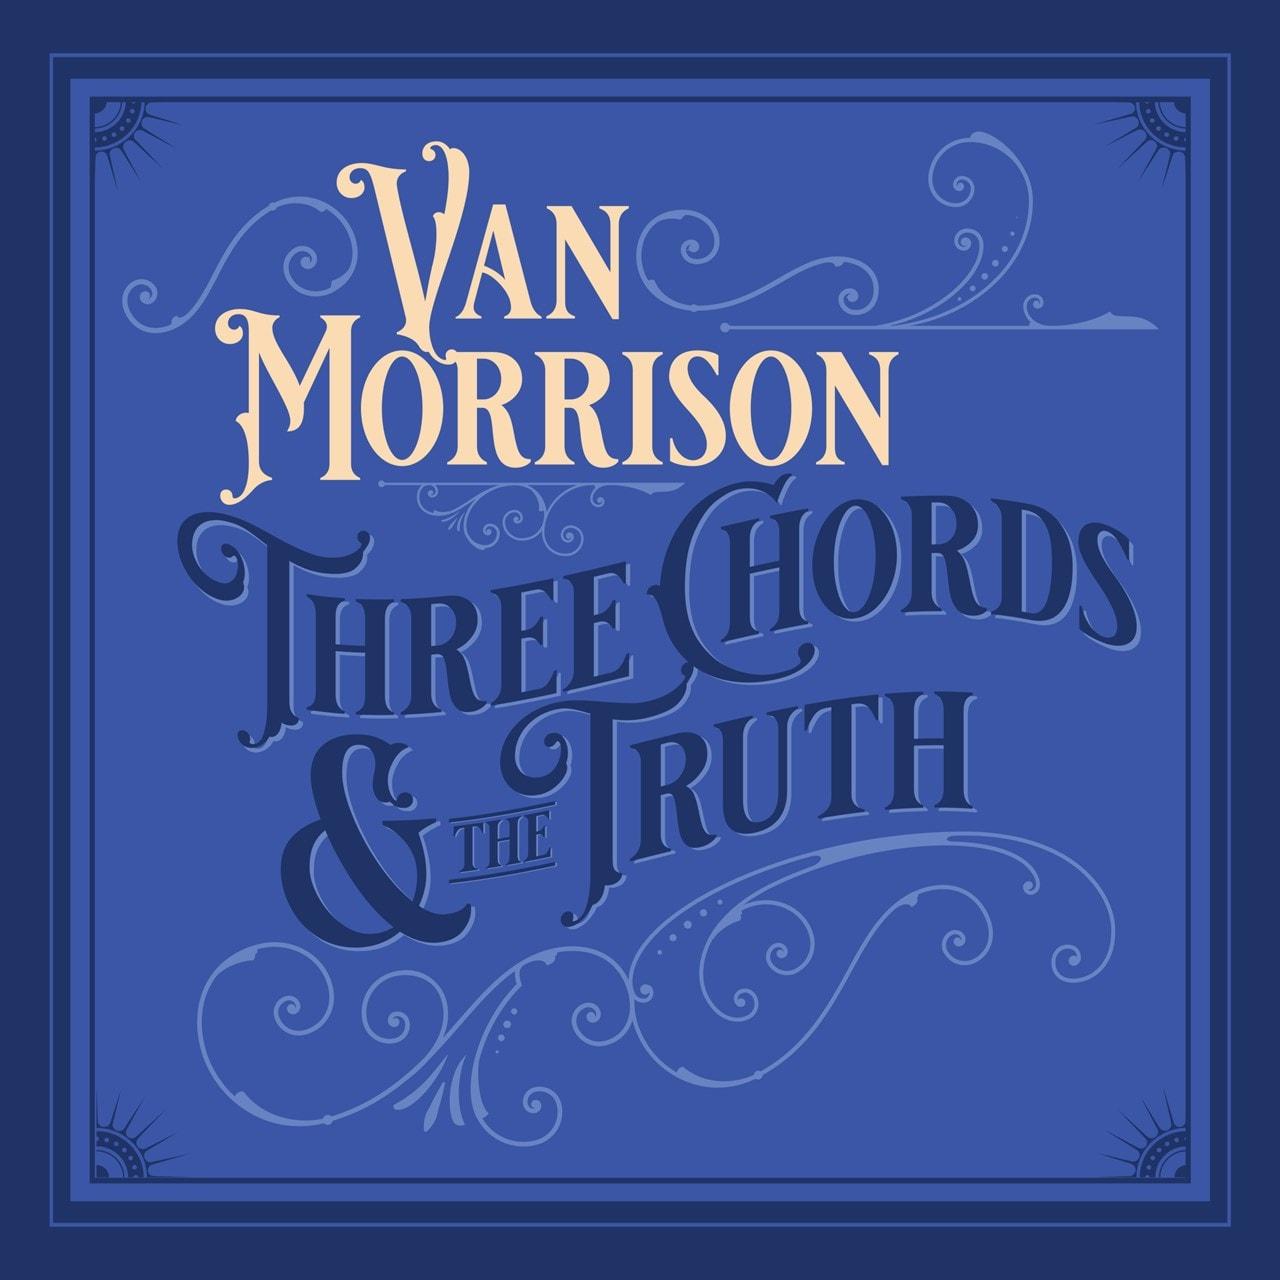 Three Chords & the Truth - 1